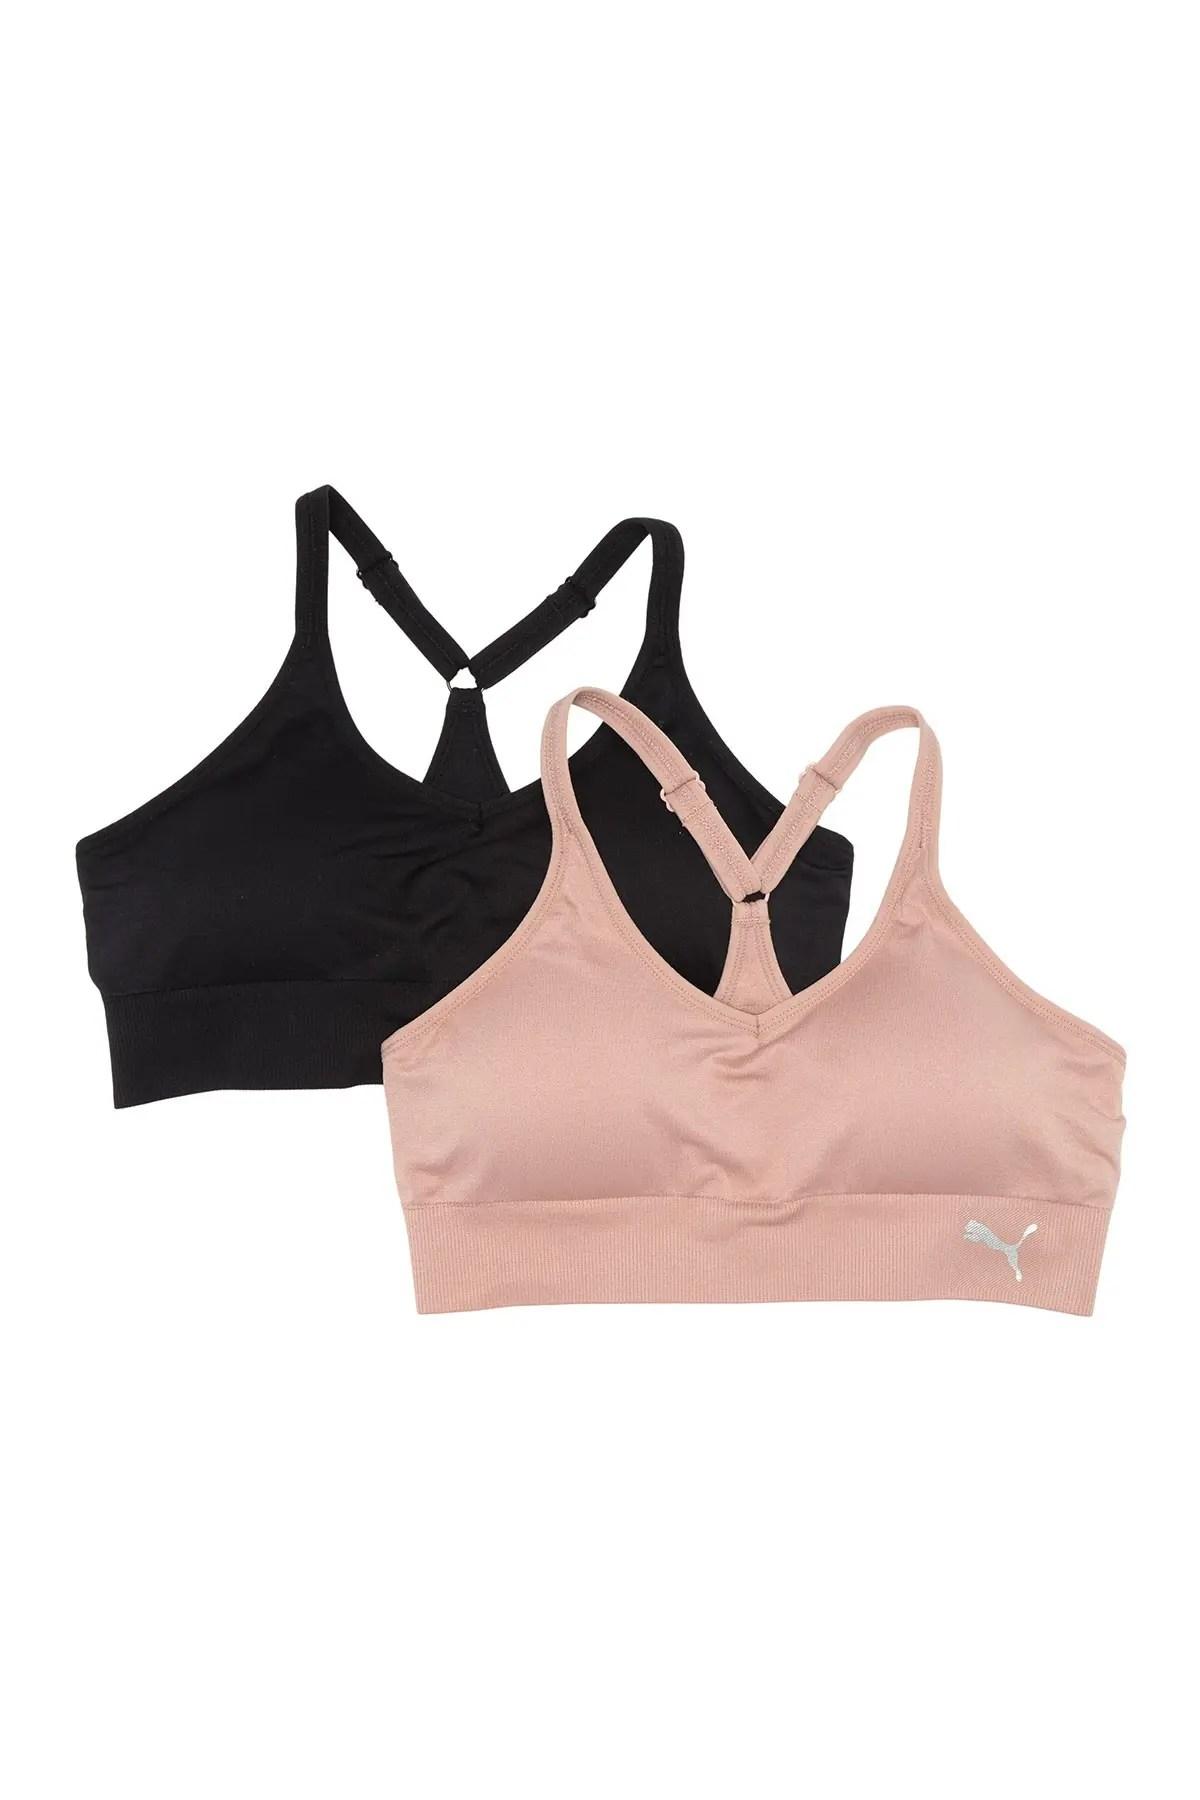 puma seamless y back sports bra pack of 2 nordstrom rack